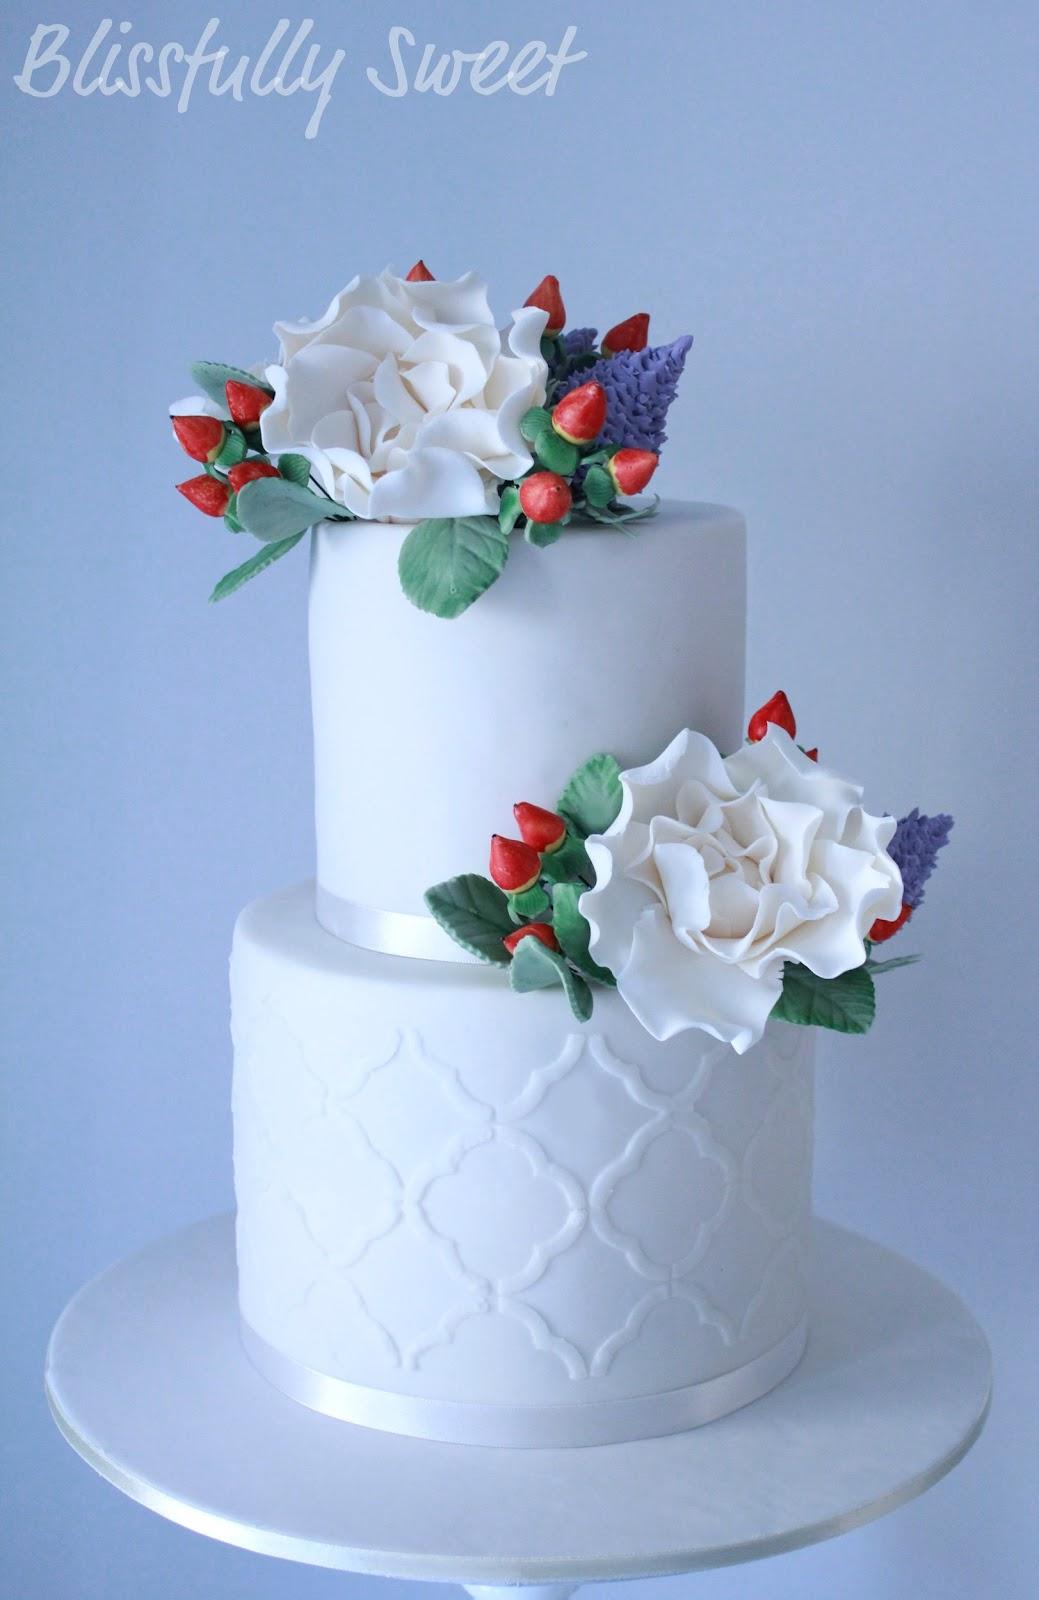 blissfully sweet stencil blooms wedding cake. Black Bedroom Furniture Sets. Home Design Ideas